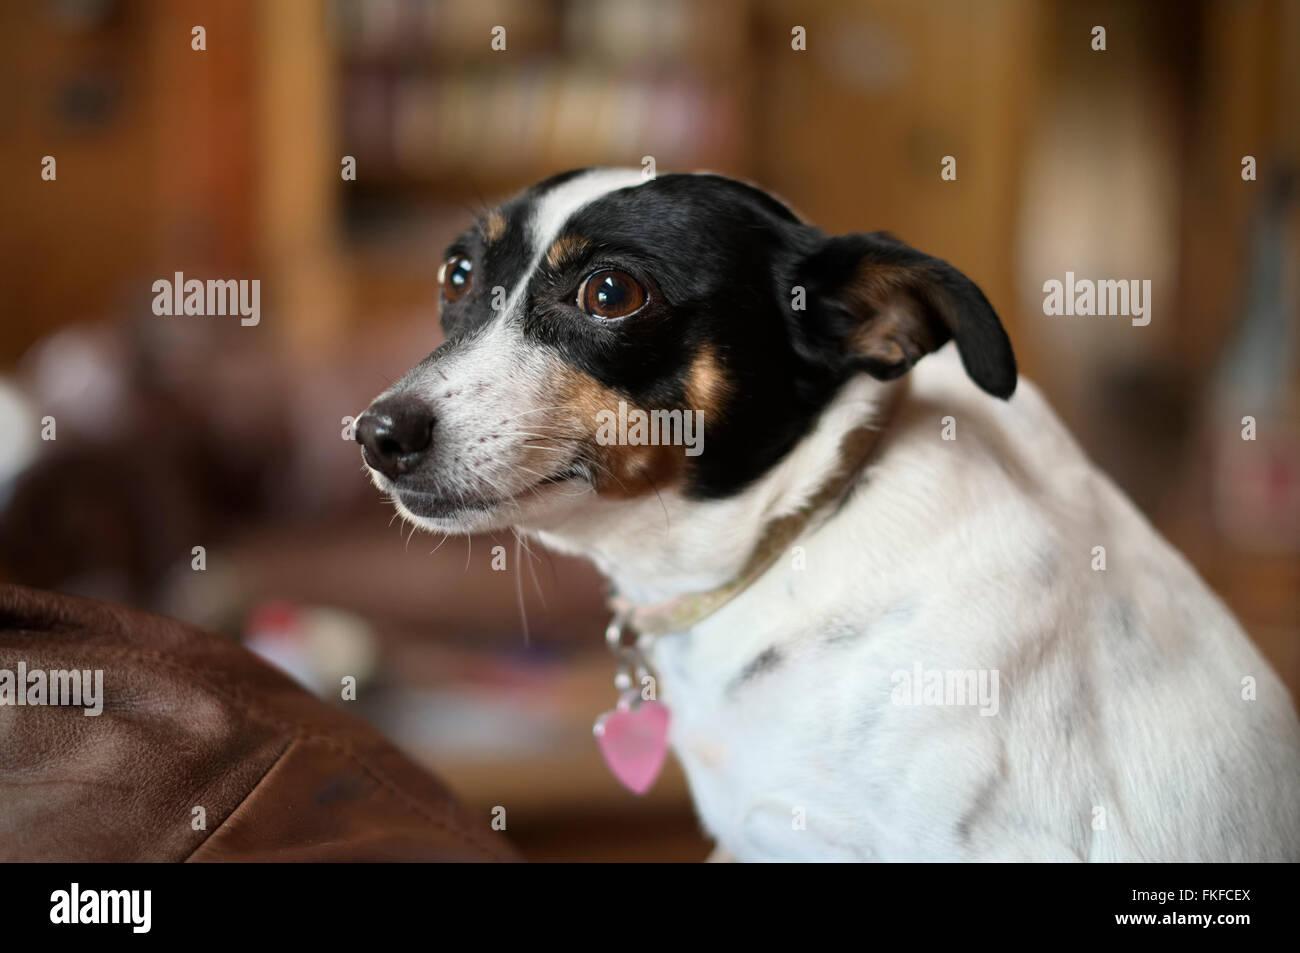 Rat Terrier dog indoors. Portrait style image - Stock Image